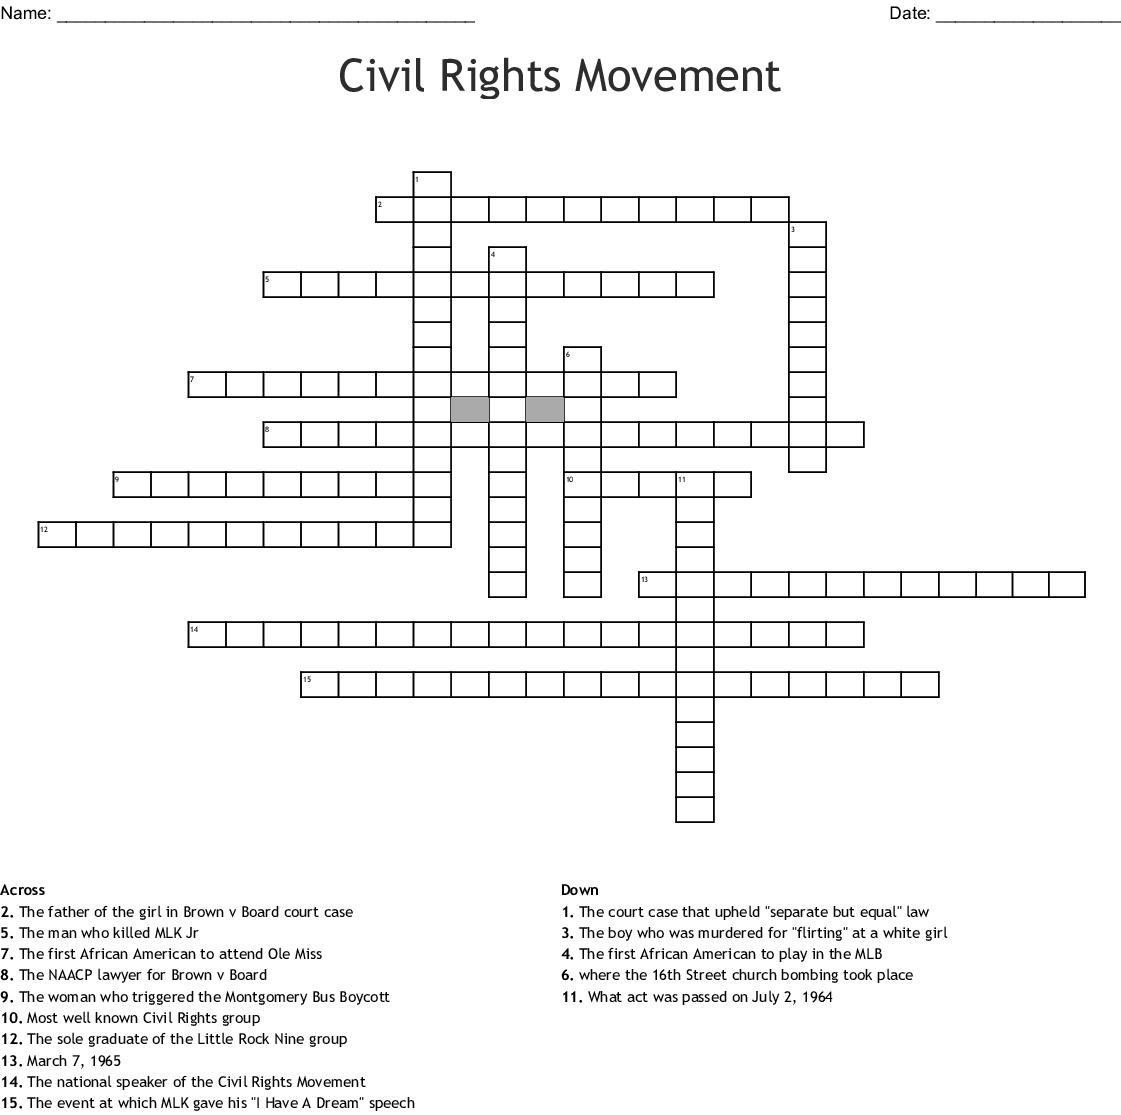 Civil Rights Movement Crossword - WordMint